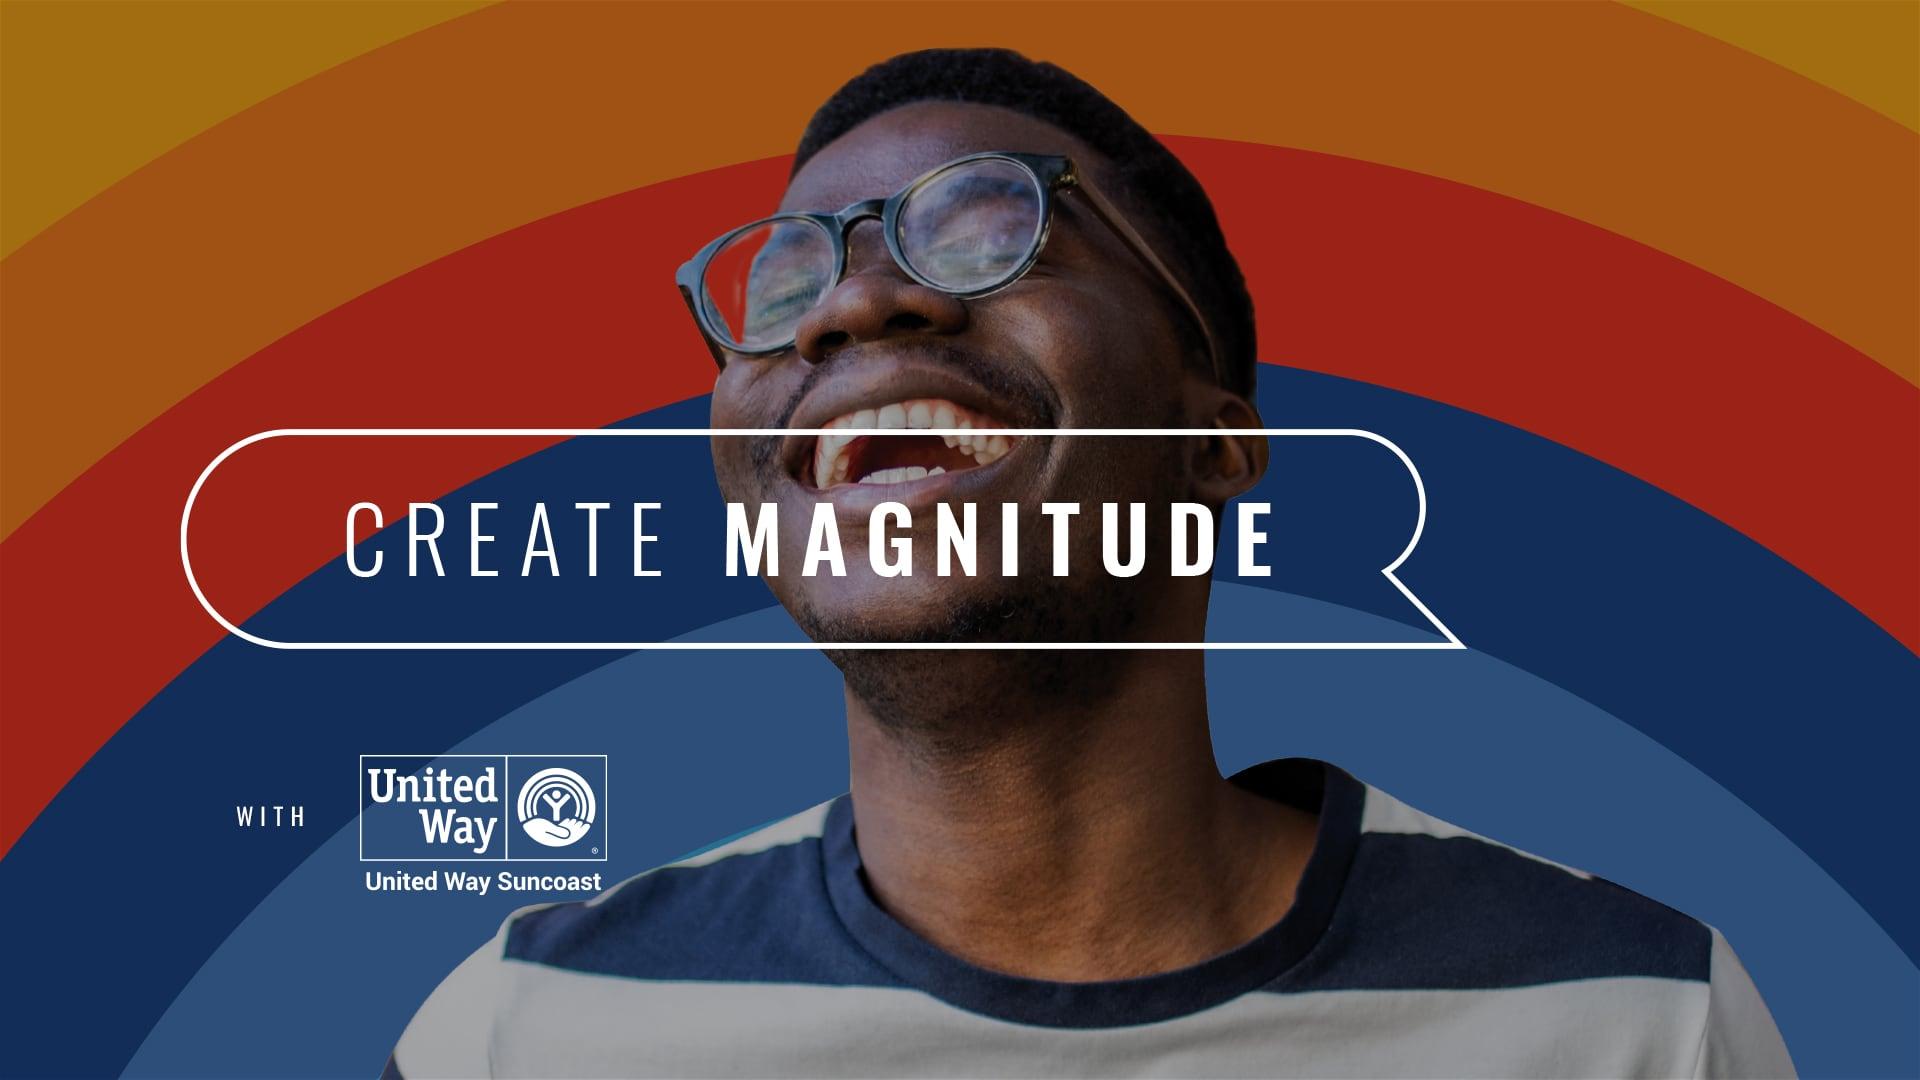 Create Magnitude